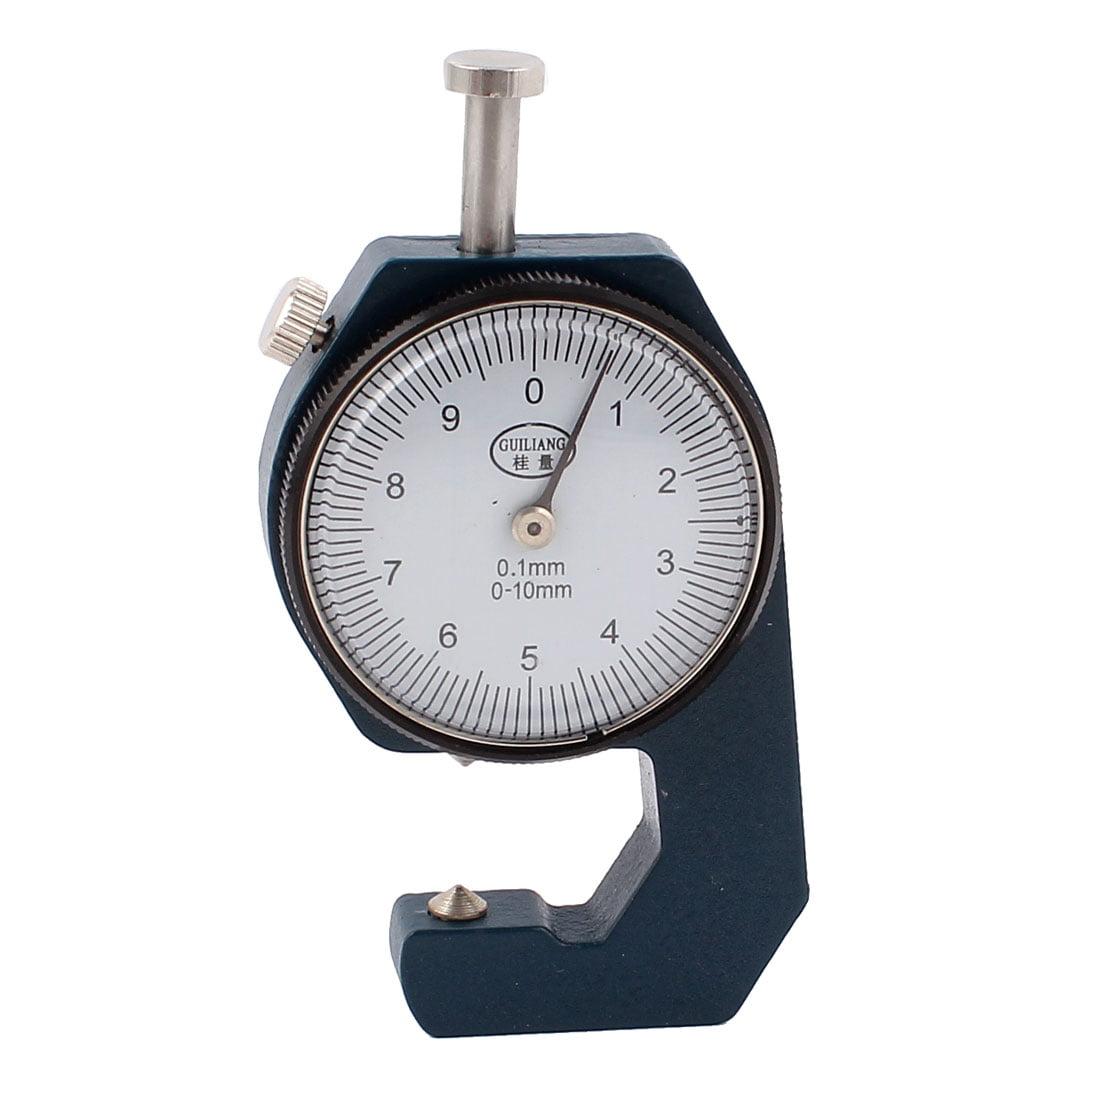 Unique Bargains 0-10mm x 0.1mm Precision Dial Indicator Handheld Thickness Gauge Measuring Tool by Unique-Bargains